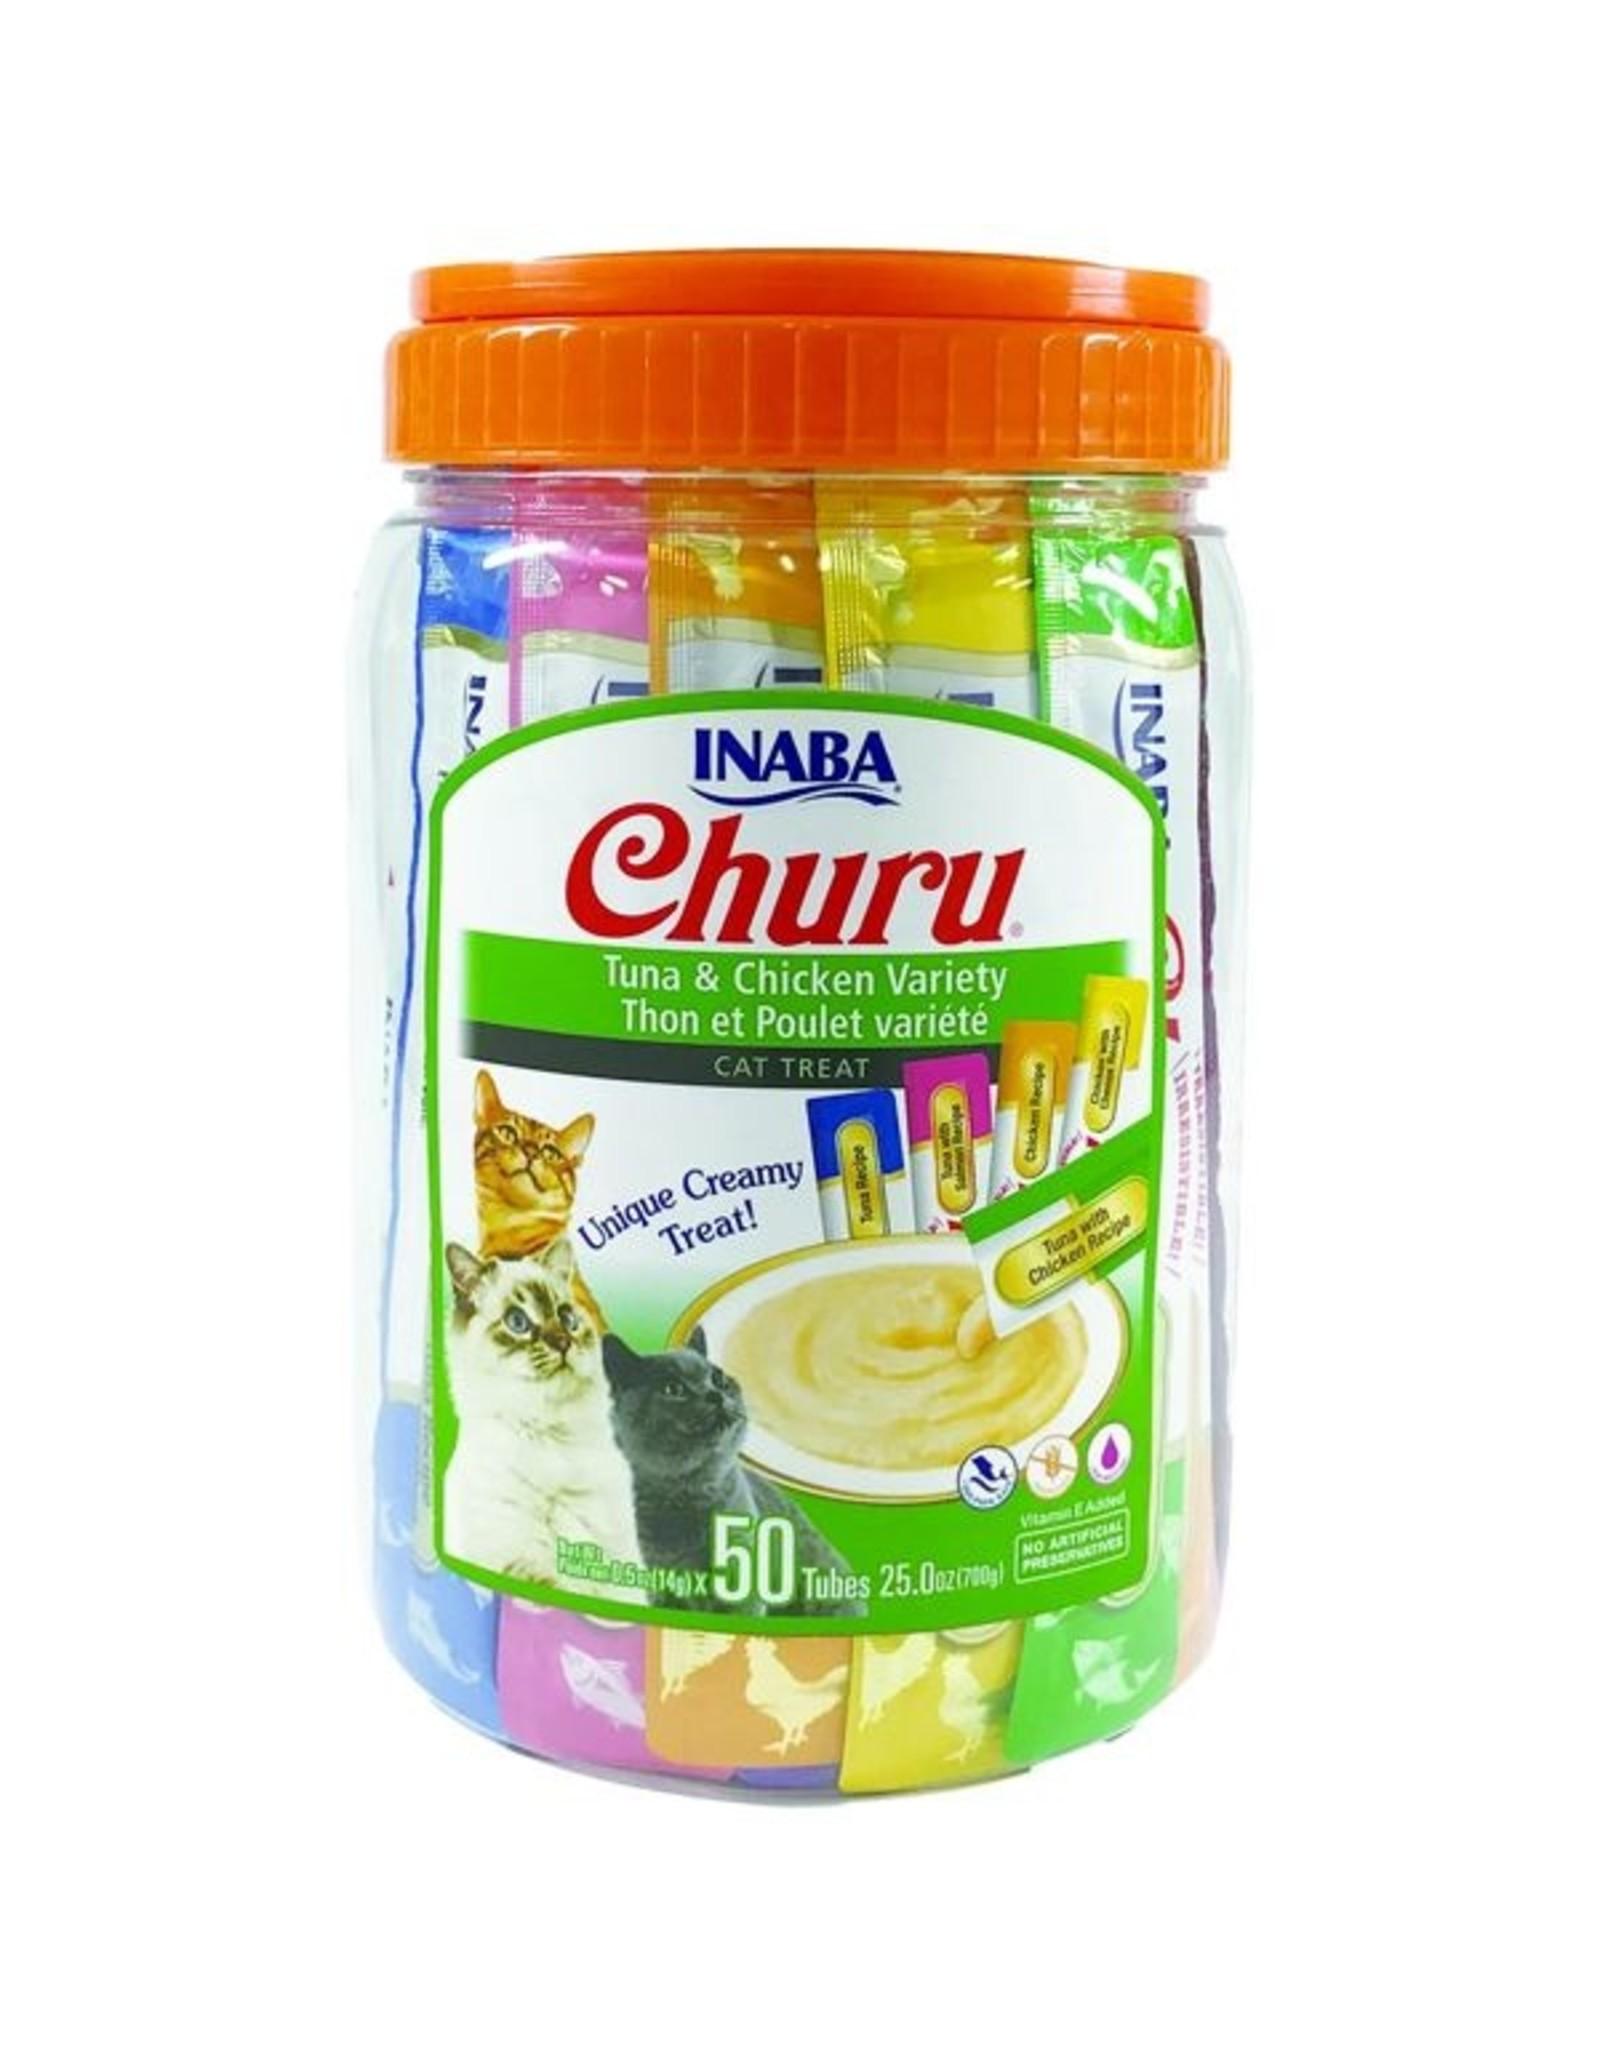 Inaba Inaba Churu Tubes Tuna and Chicken Cat Treats Variety Pack 50 Tubes